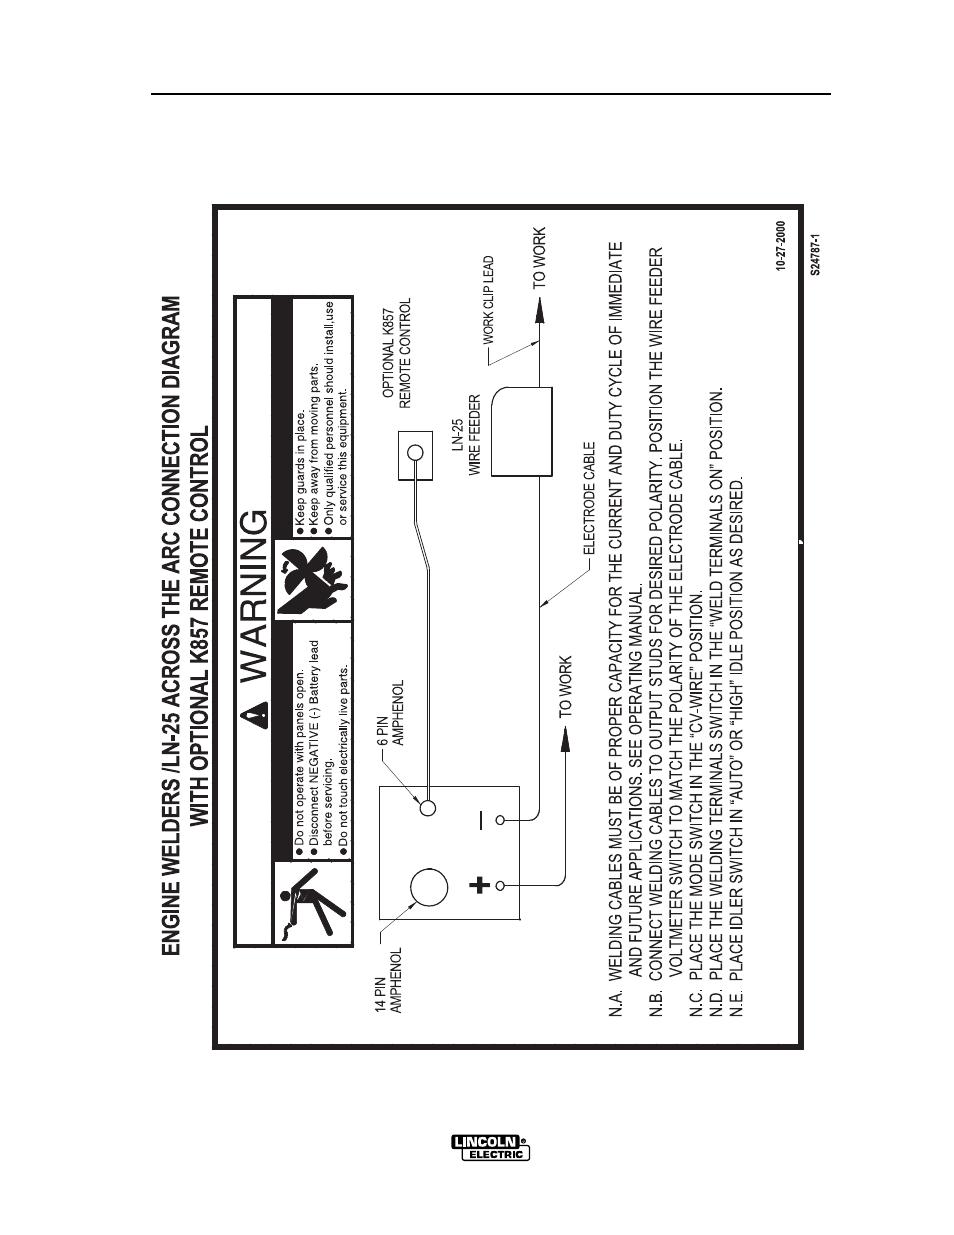 Vantage Wiring Diagram Wire Center Centurion 3000 Lincoln 575 For Light Switch U2022 Rh Drnatnews Com Vintage H Telecaster Warn